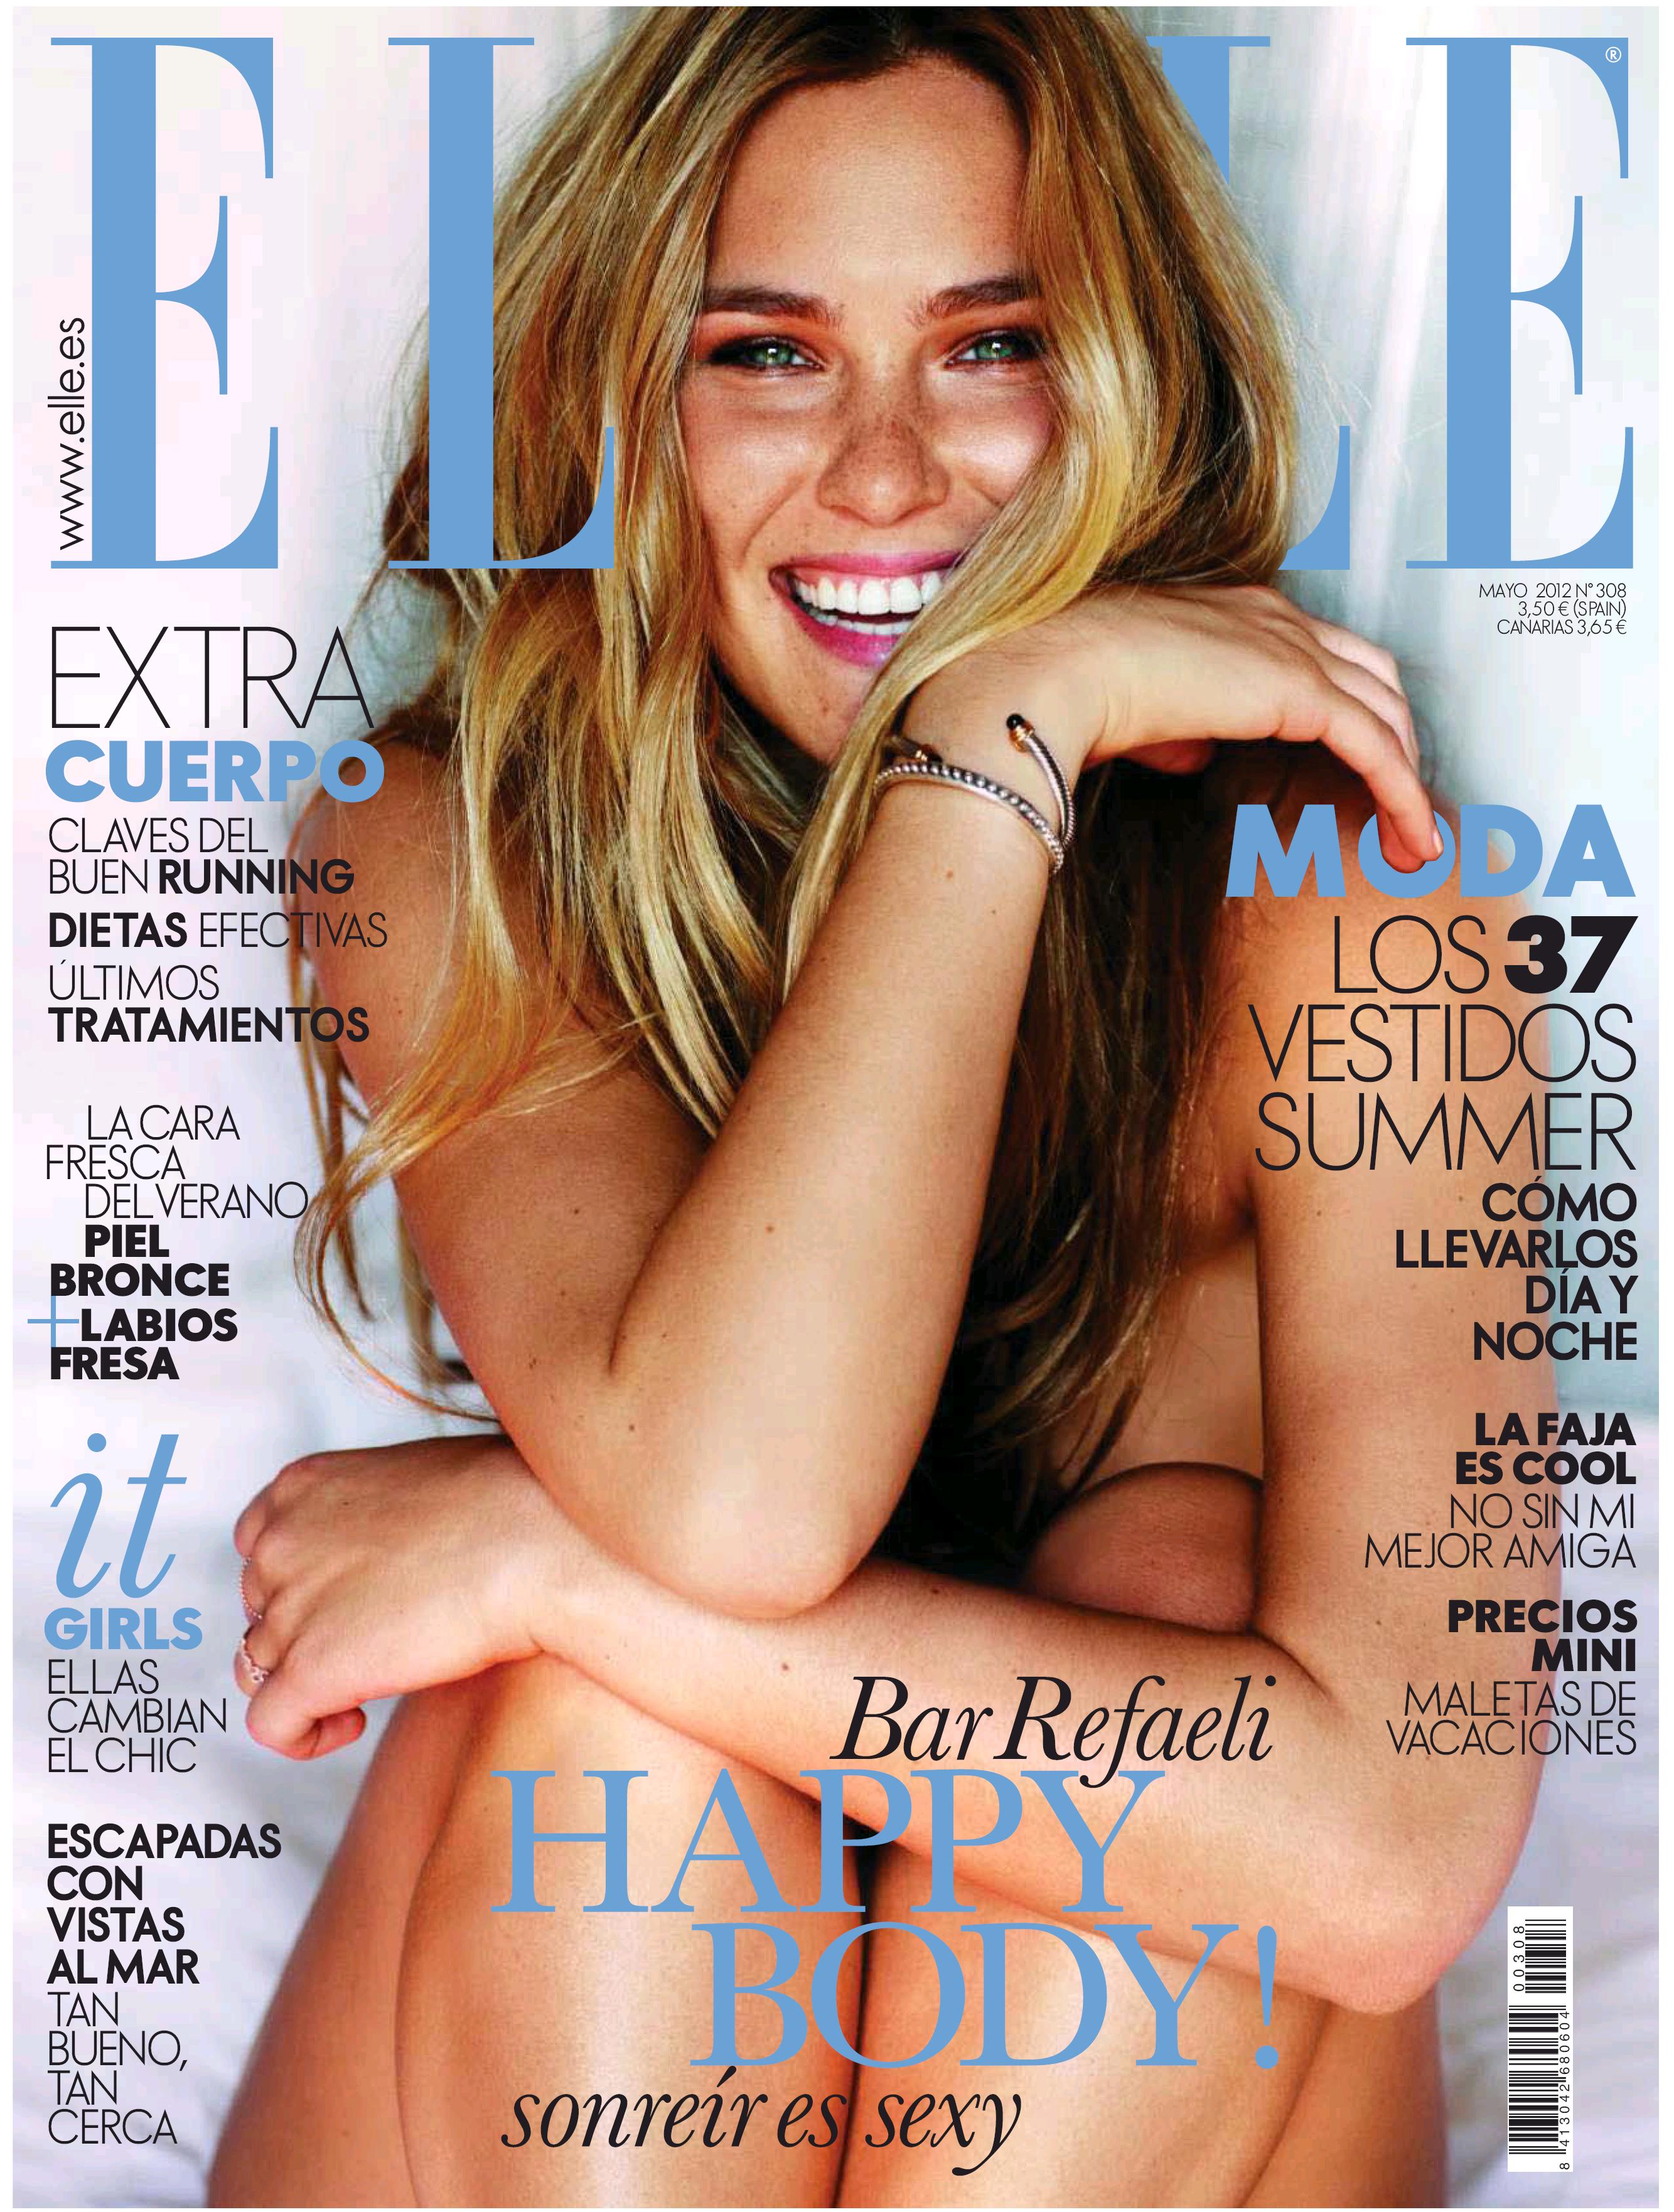 ELLE portada Mayo 2012